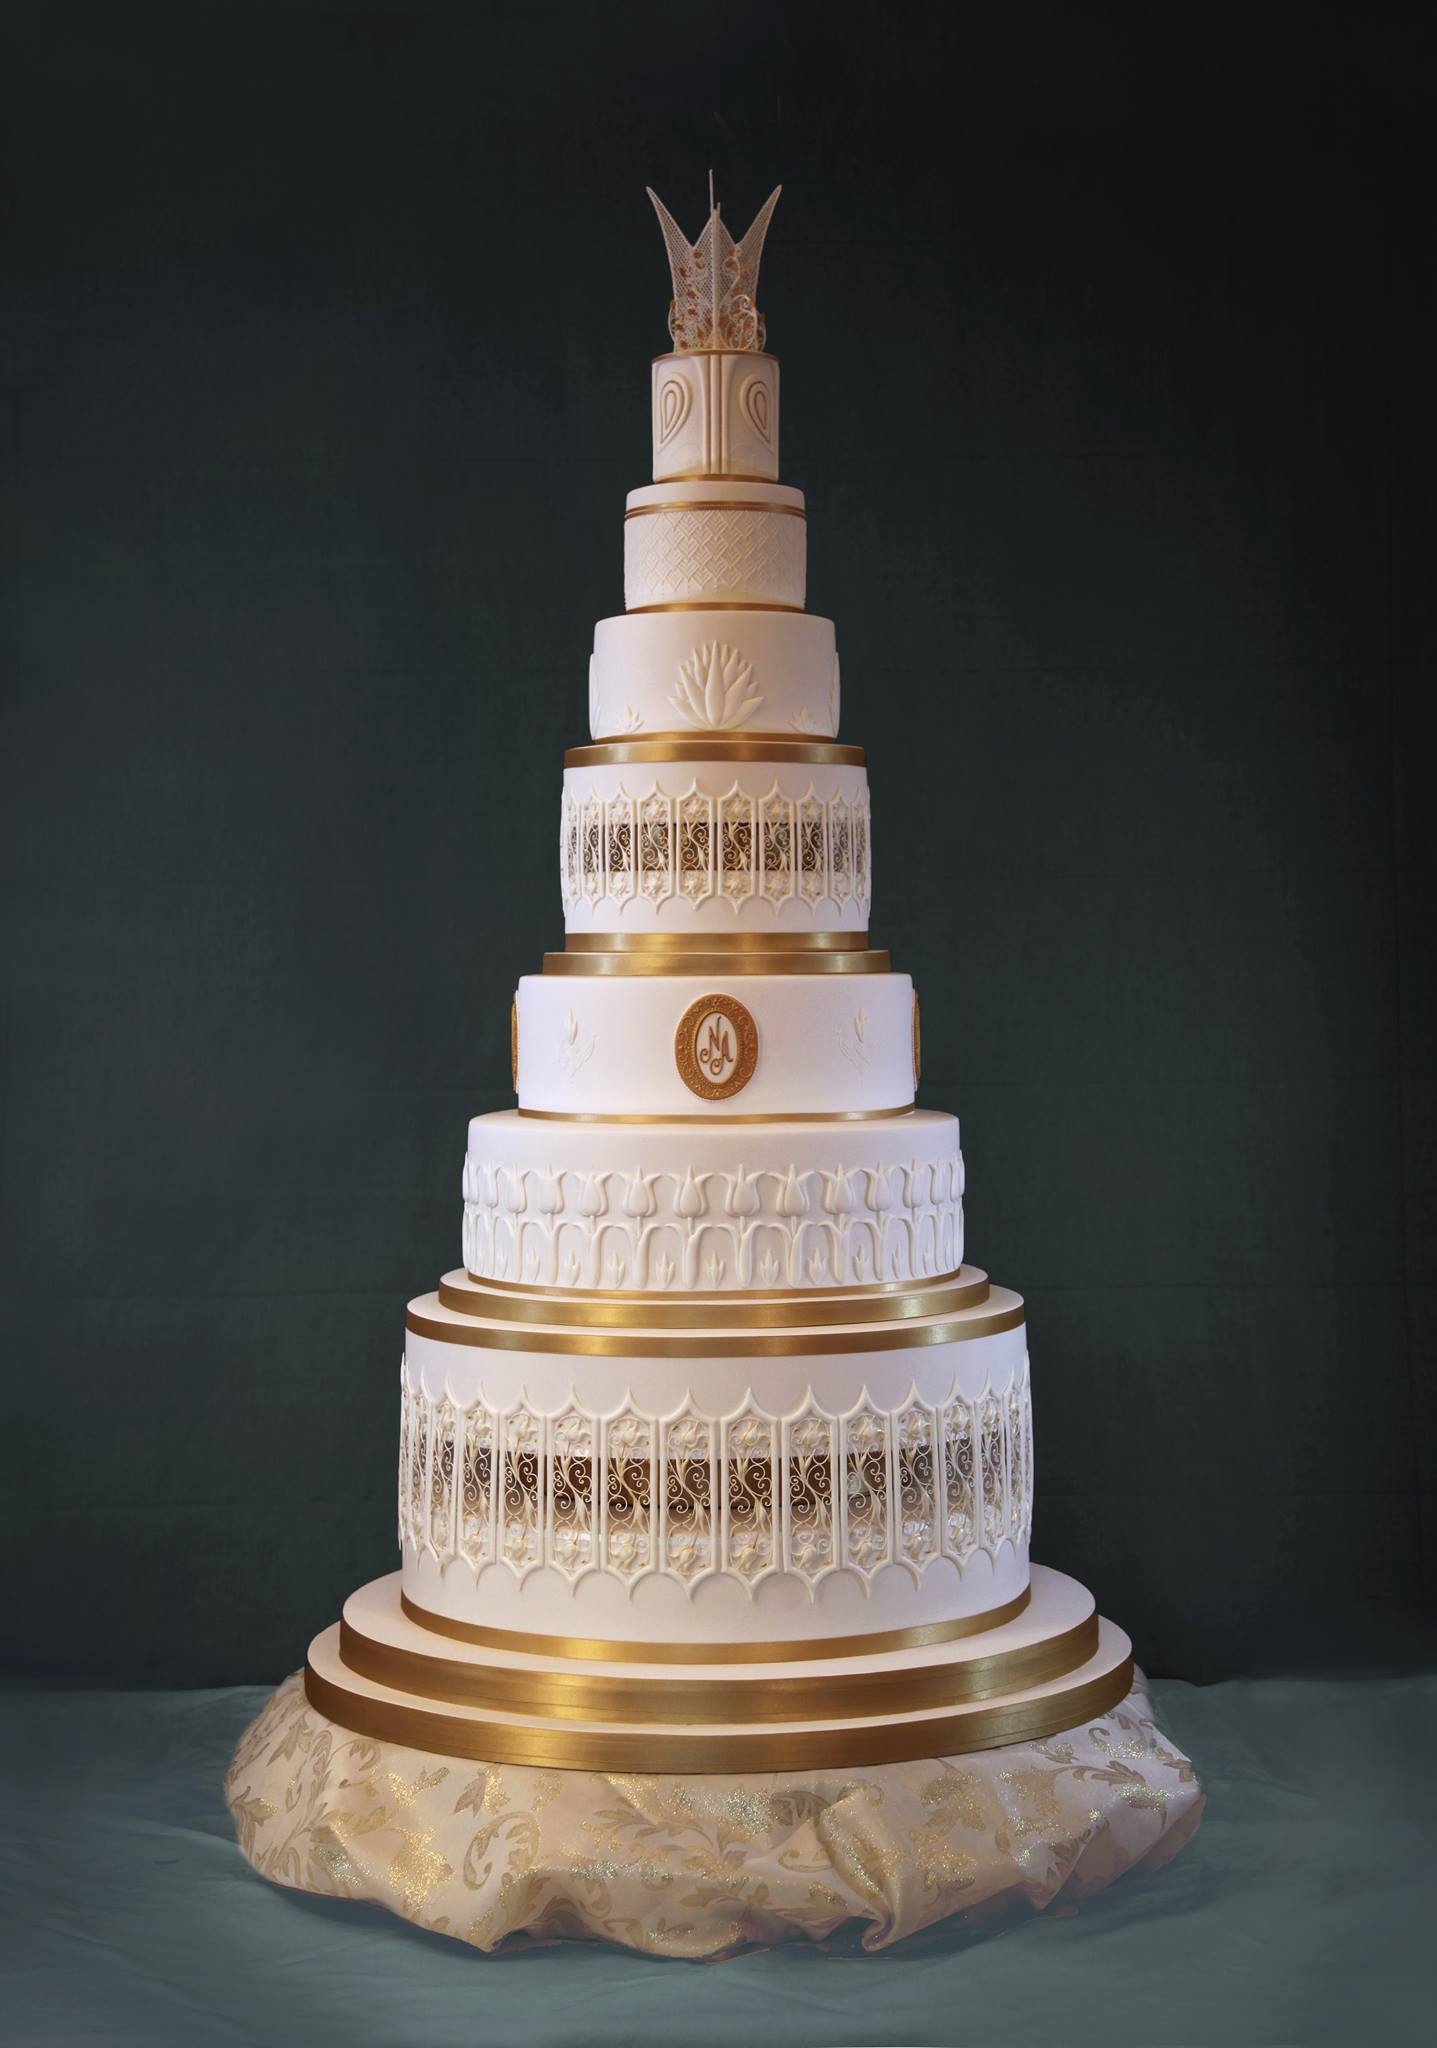 Gigantic Wedding Cakes  Huge Cake Dummies